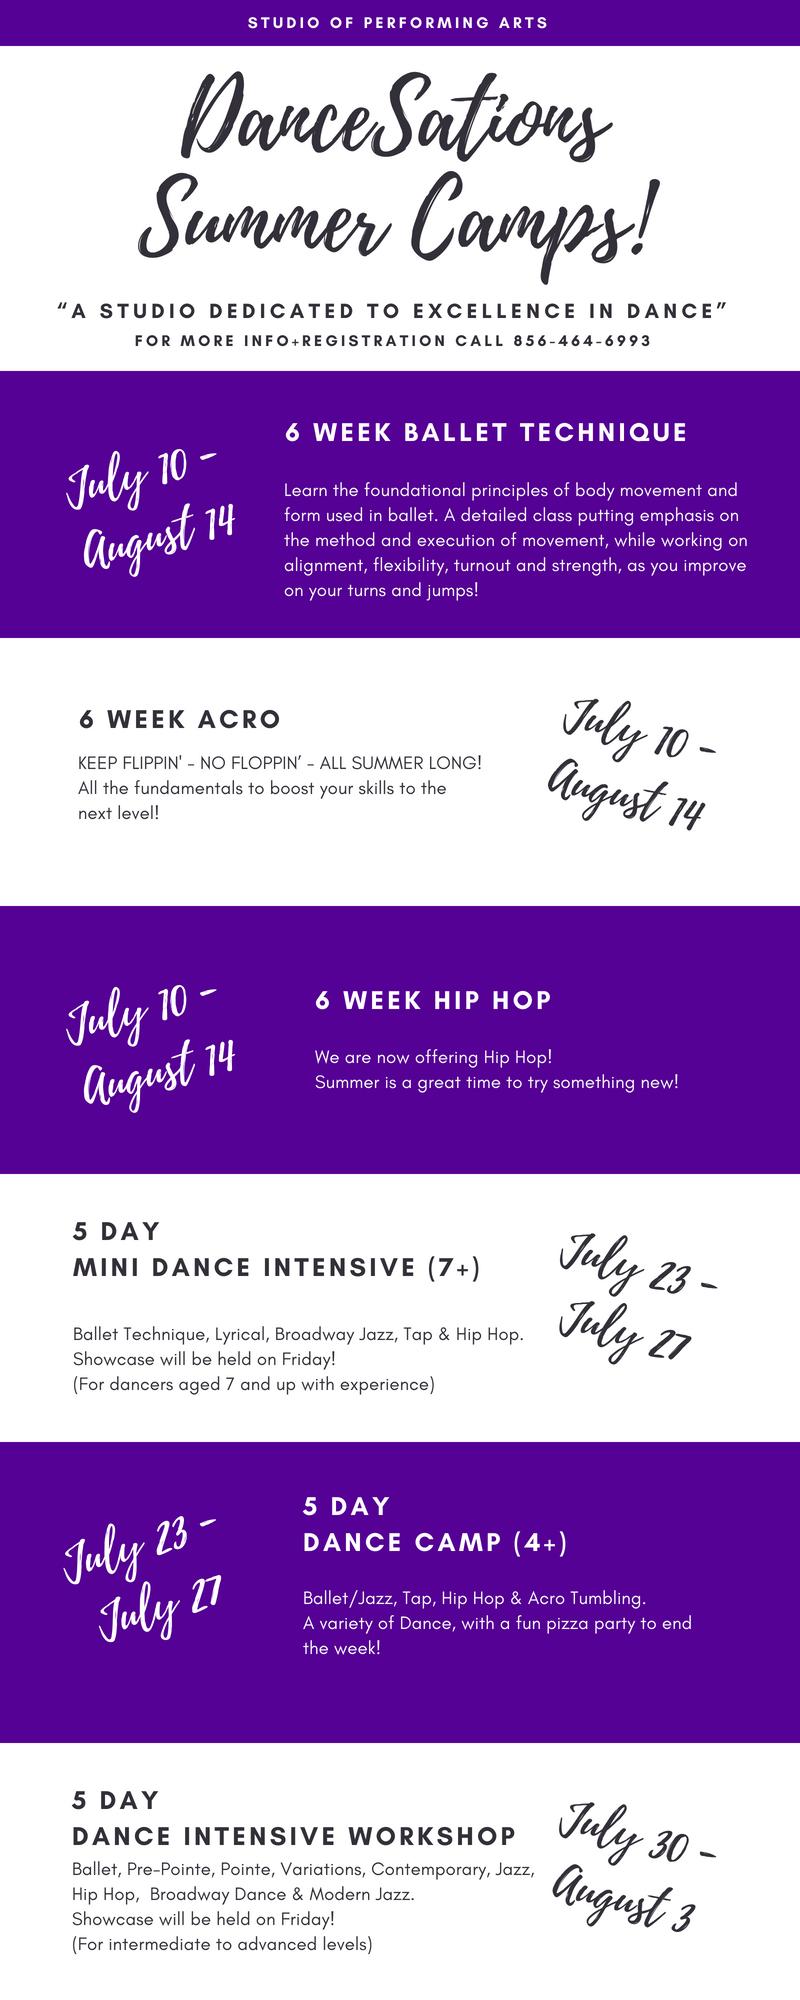 DanceSations Summer Dance Camps